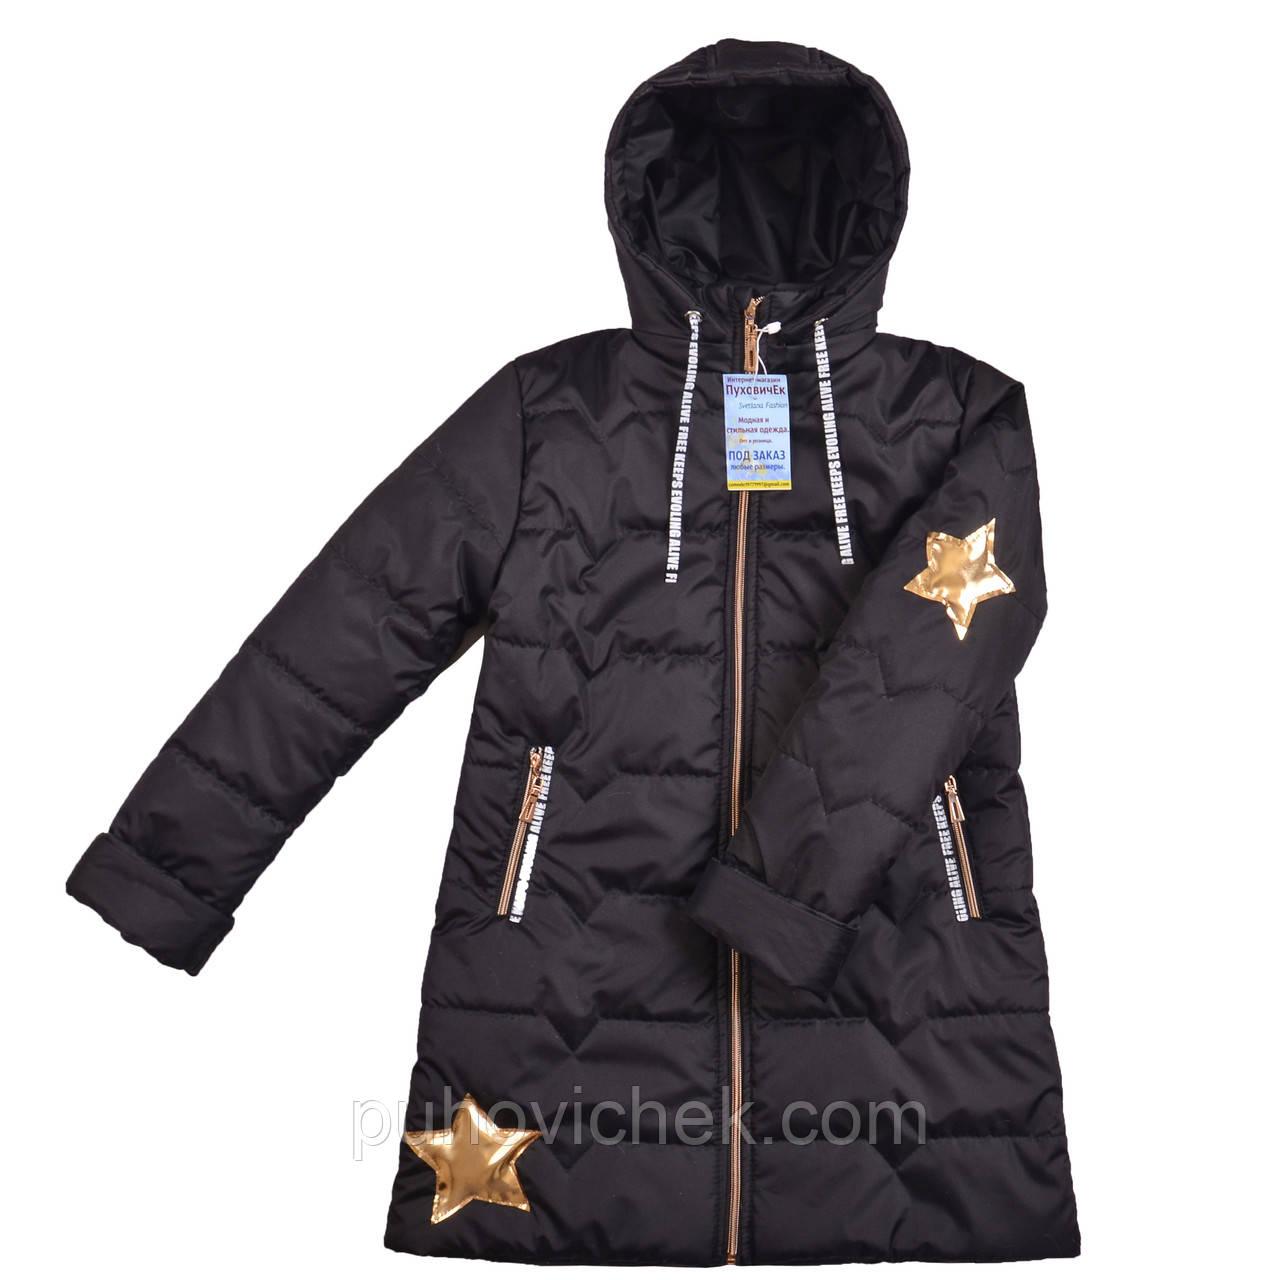 40897dbc1b3 Зимняя куртка для девочки интернет магазин Украина купить недорого ...